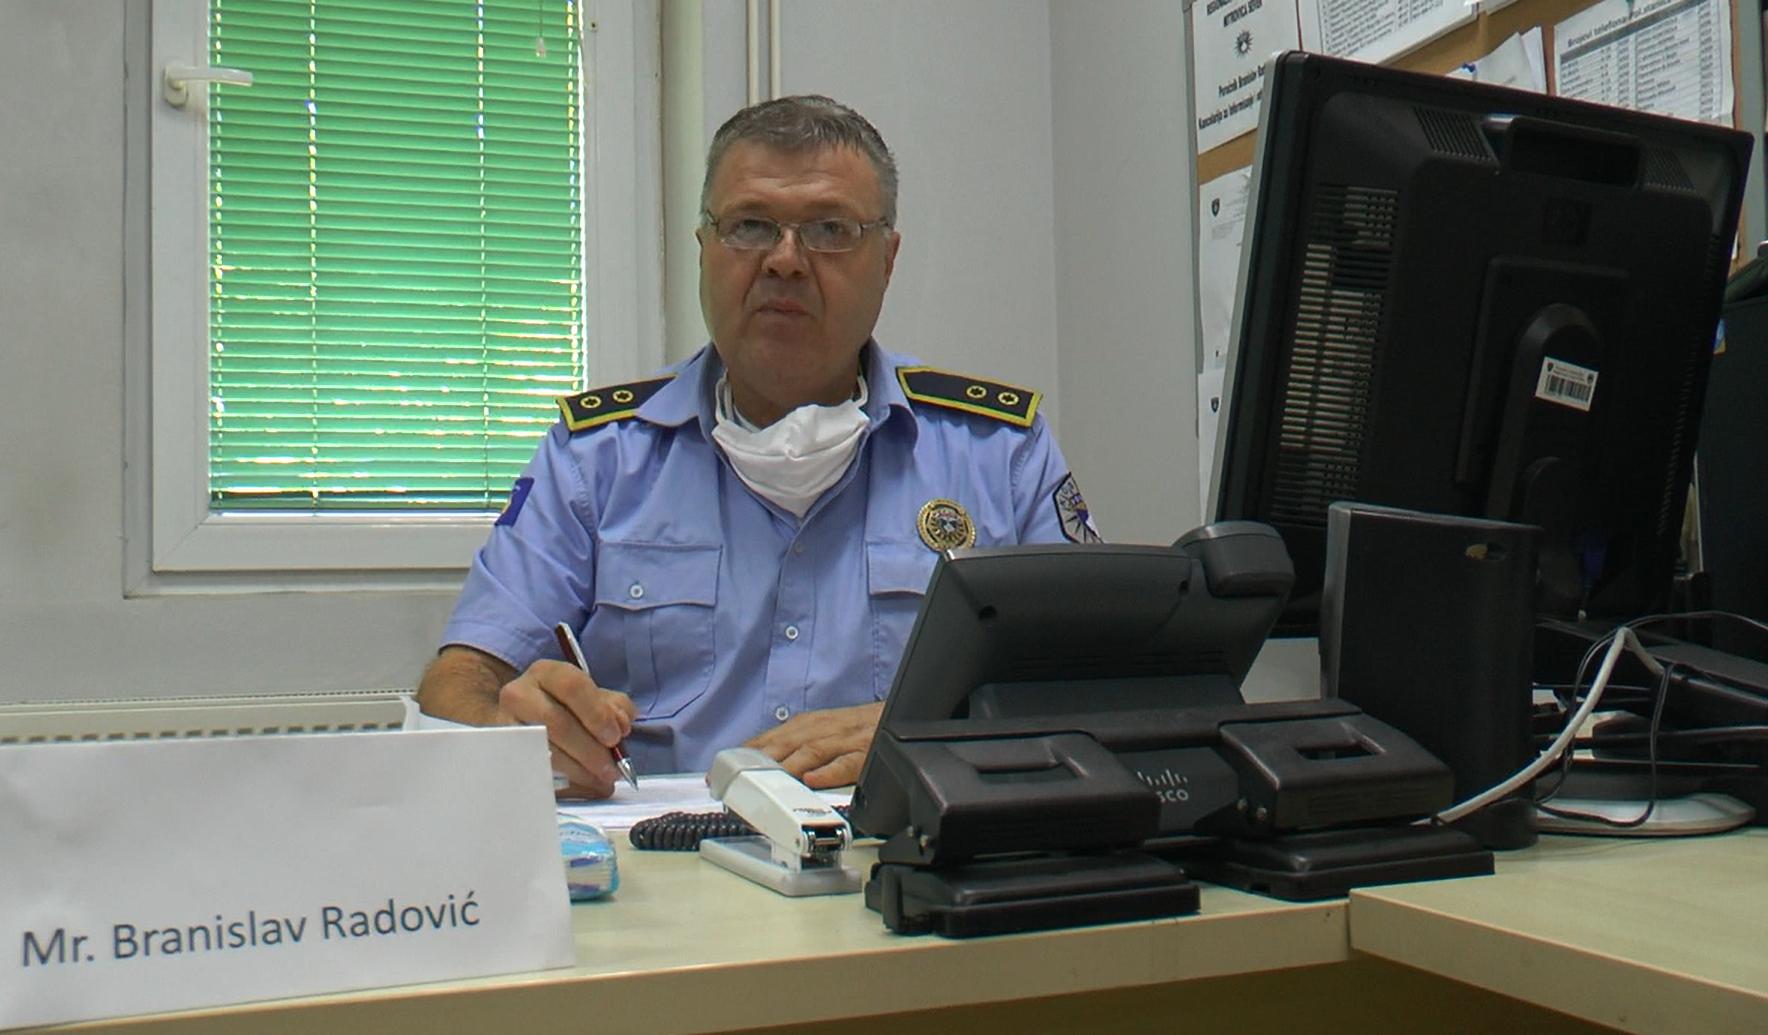 radovic-relevantne-institucije-na-kosovu-obavezne-se-da-sprovode-donesene-odluke